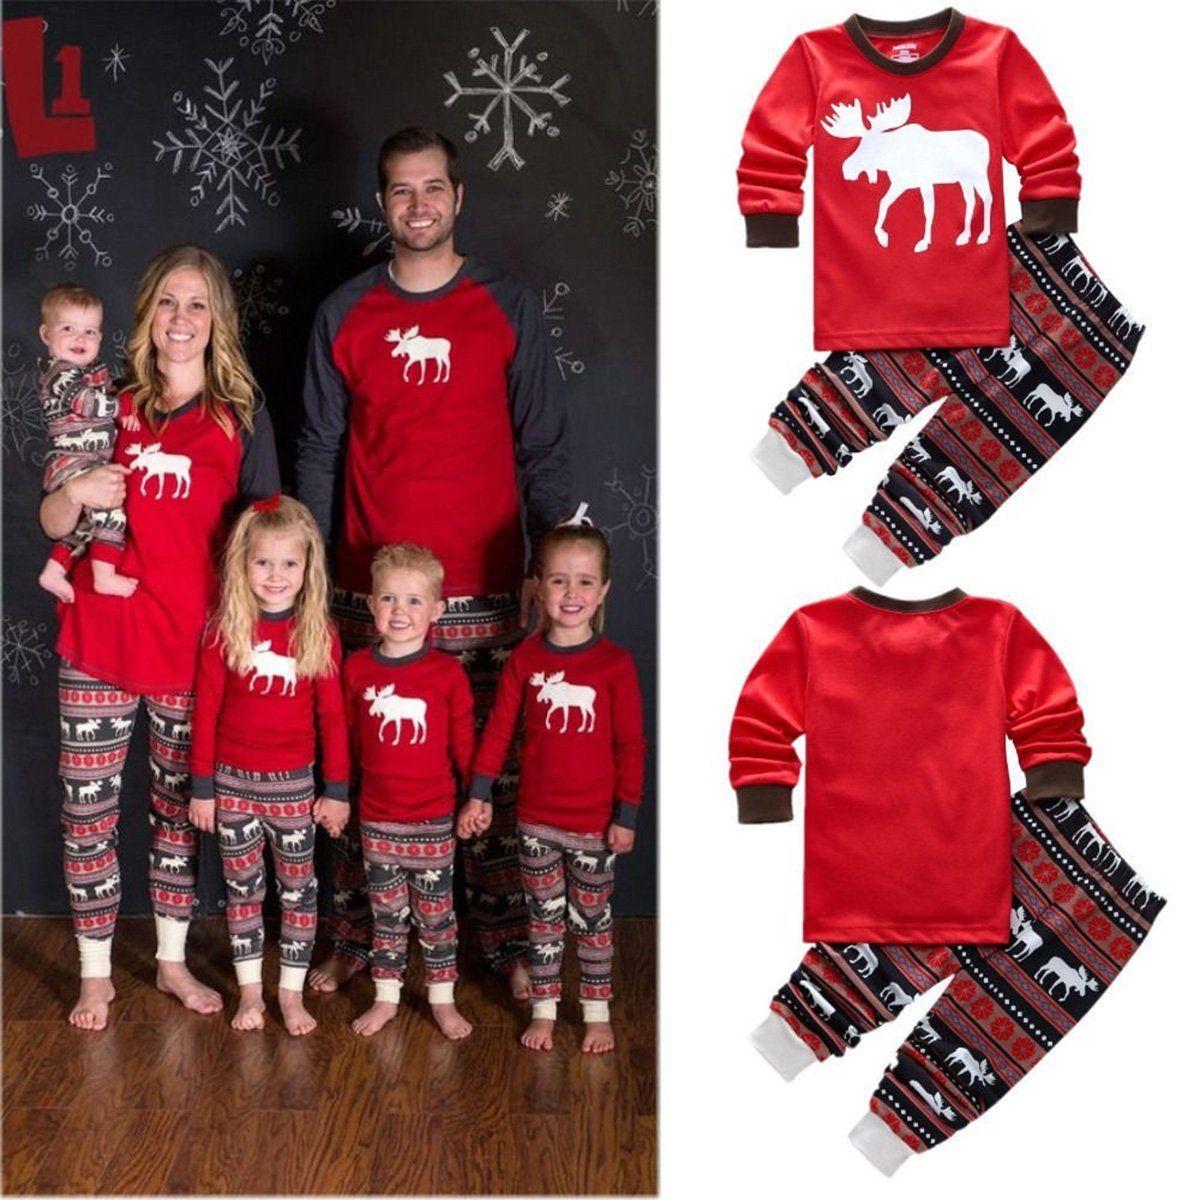 03761ed715  5.99 - Christmas Family Matching Pajamas Set Deer Kids Baby Adult Sleepwear  Nightwear  ebay  Fashion